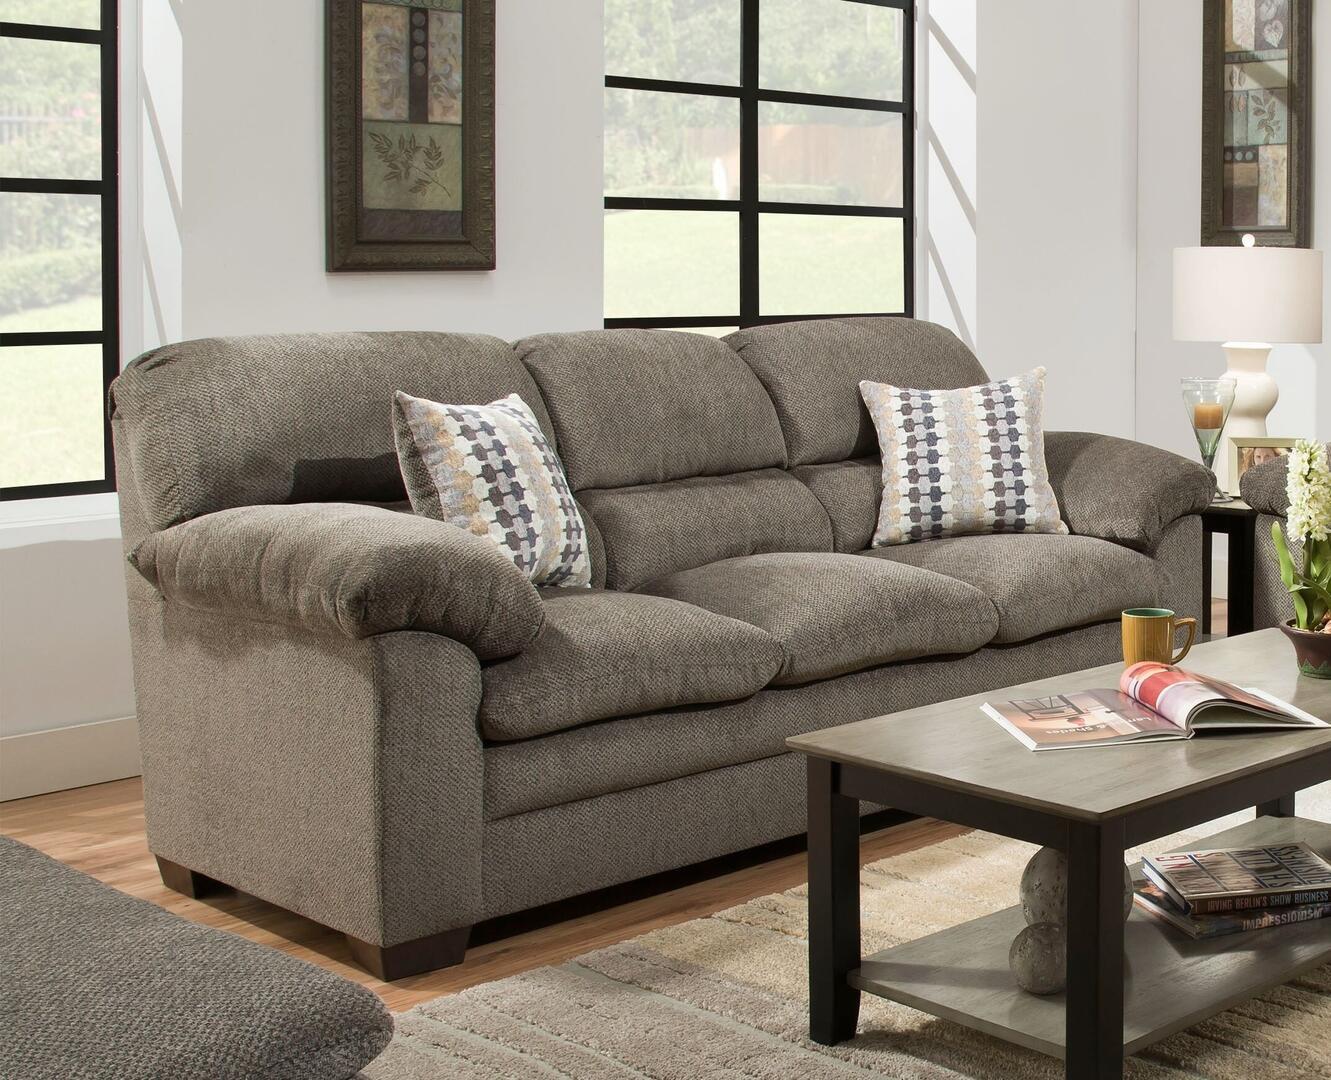 Simmons Upholstery 368303harlowash Harlow Series Stationary Chenille